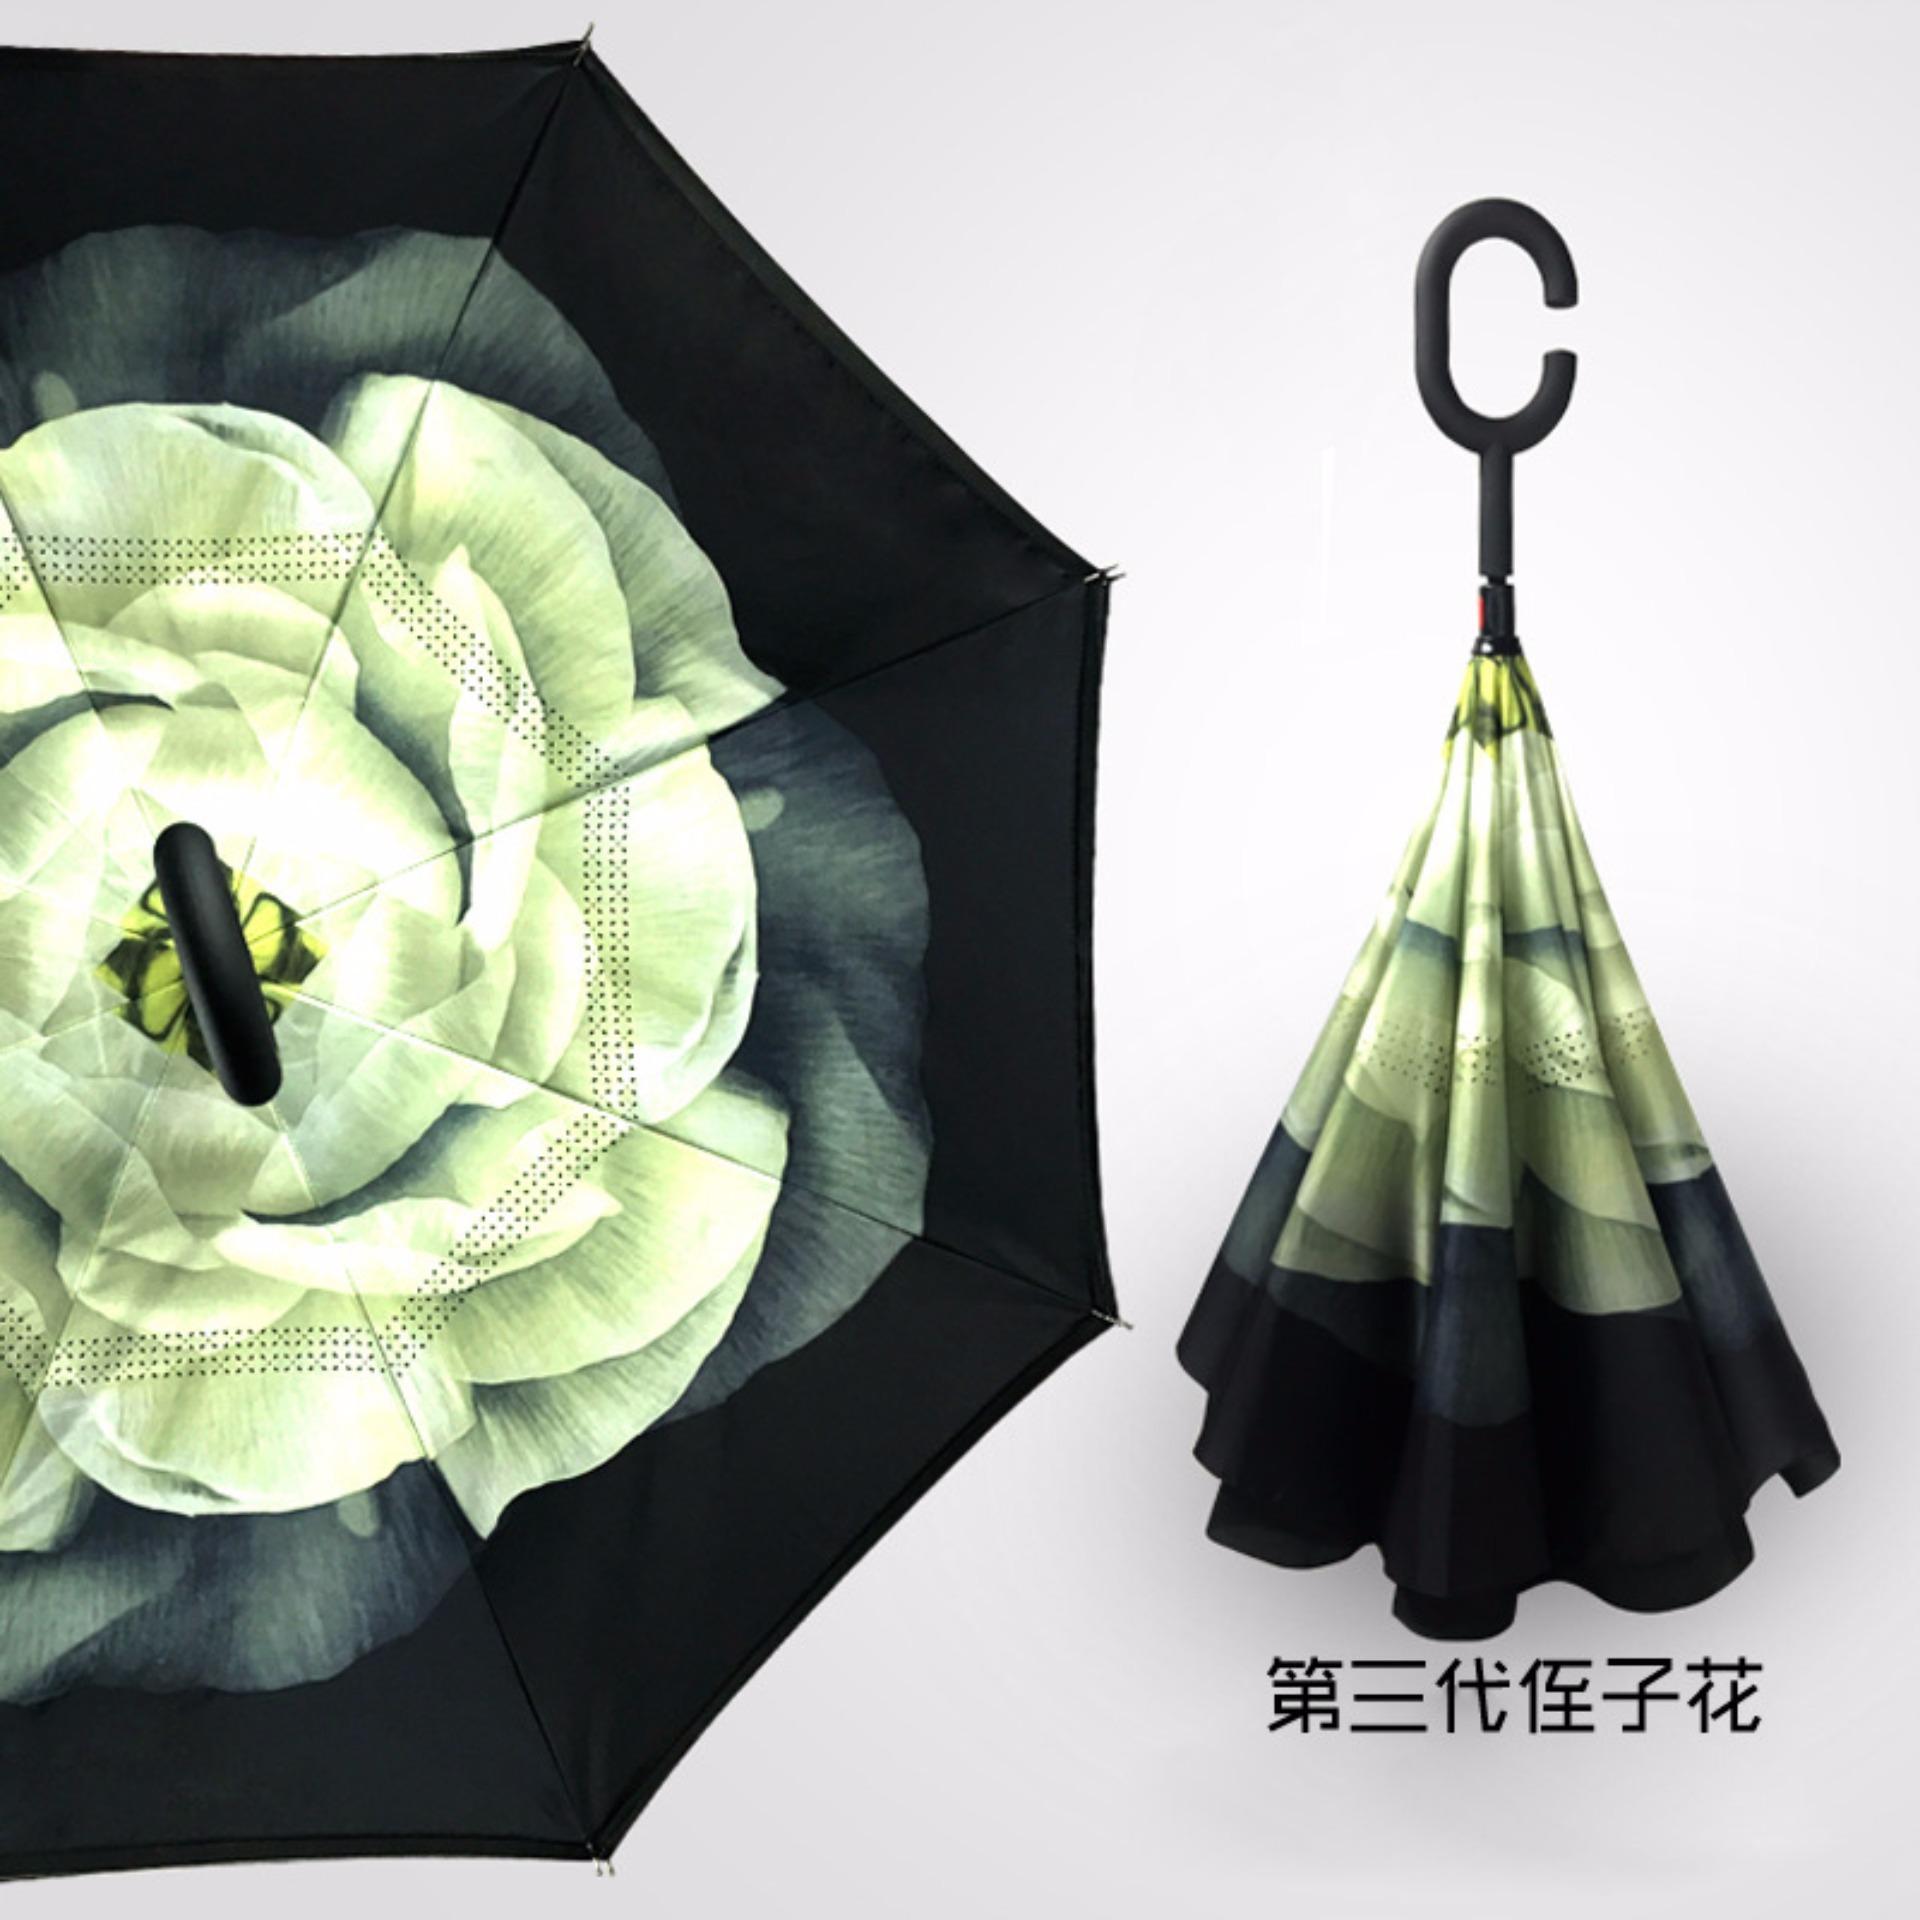 ... BEST Payung Terbalik Gagang C Reverse Umbrella Payung Lipat / Mobil- 22 HIJAU ...